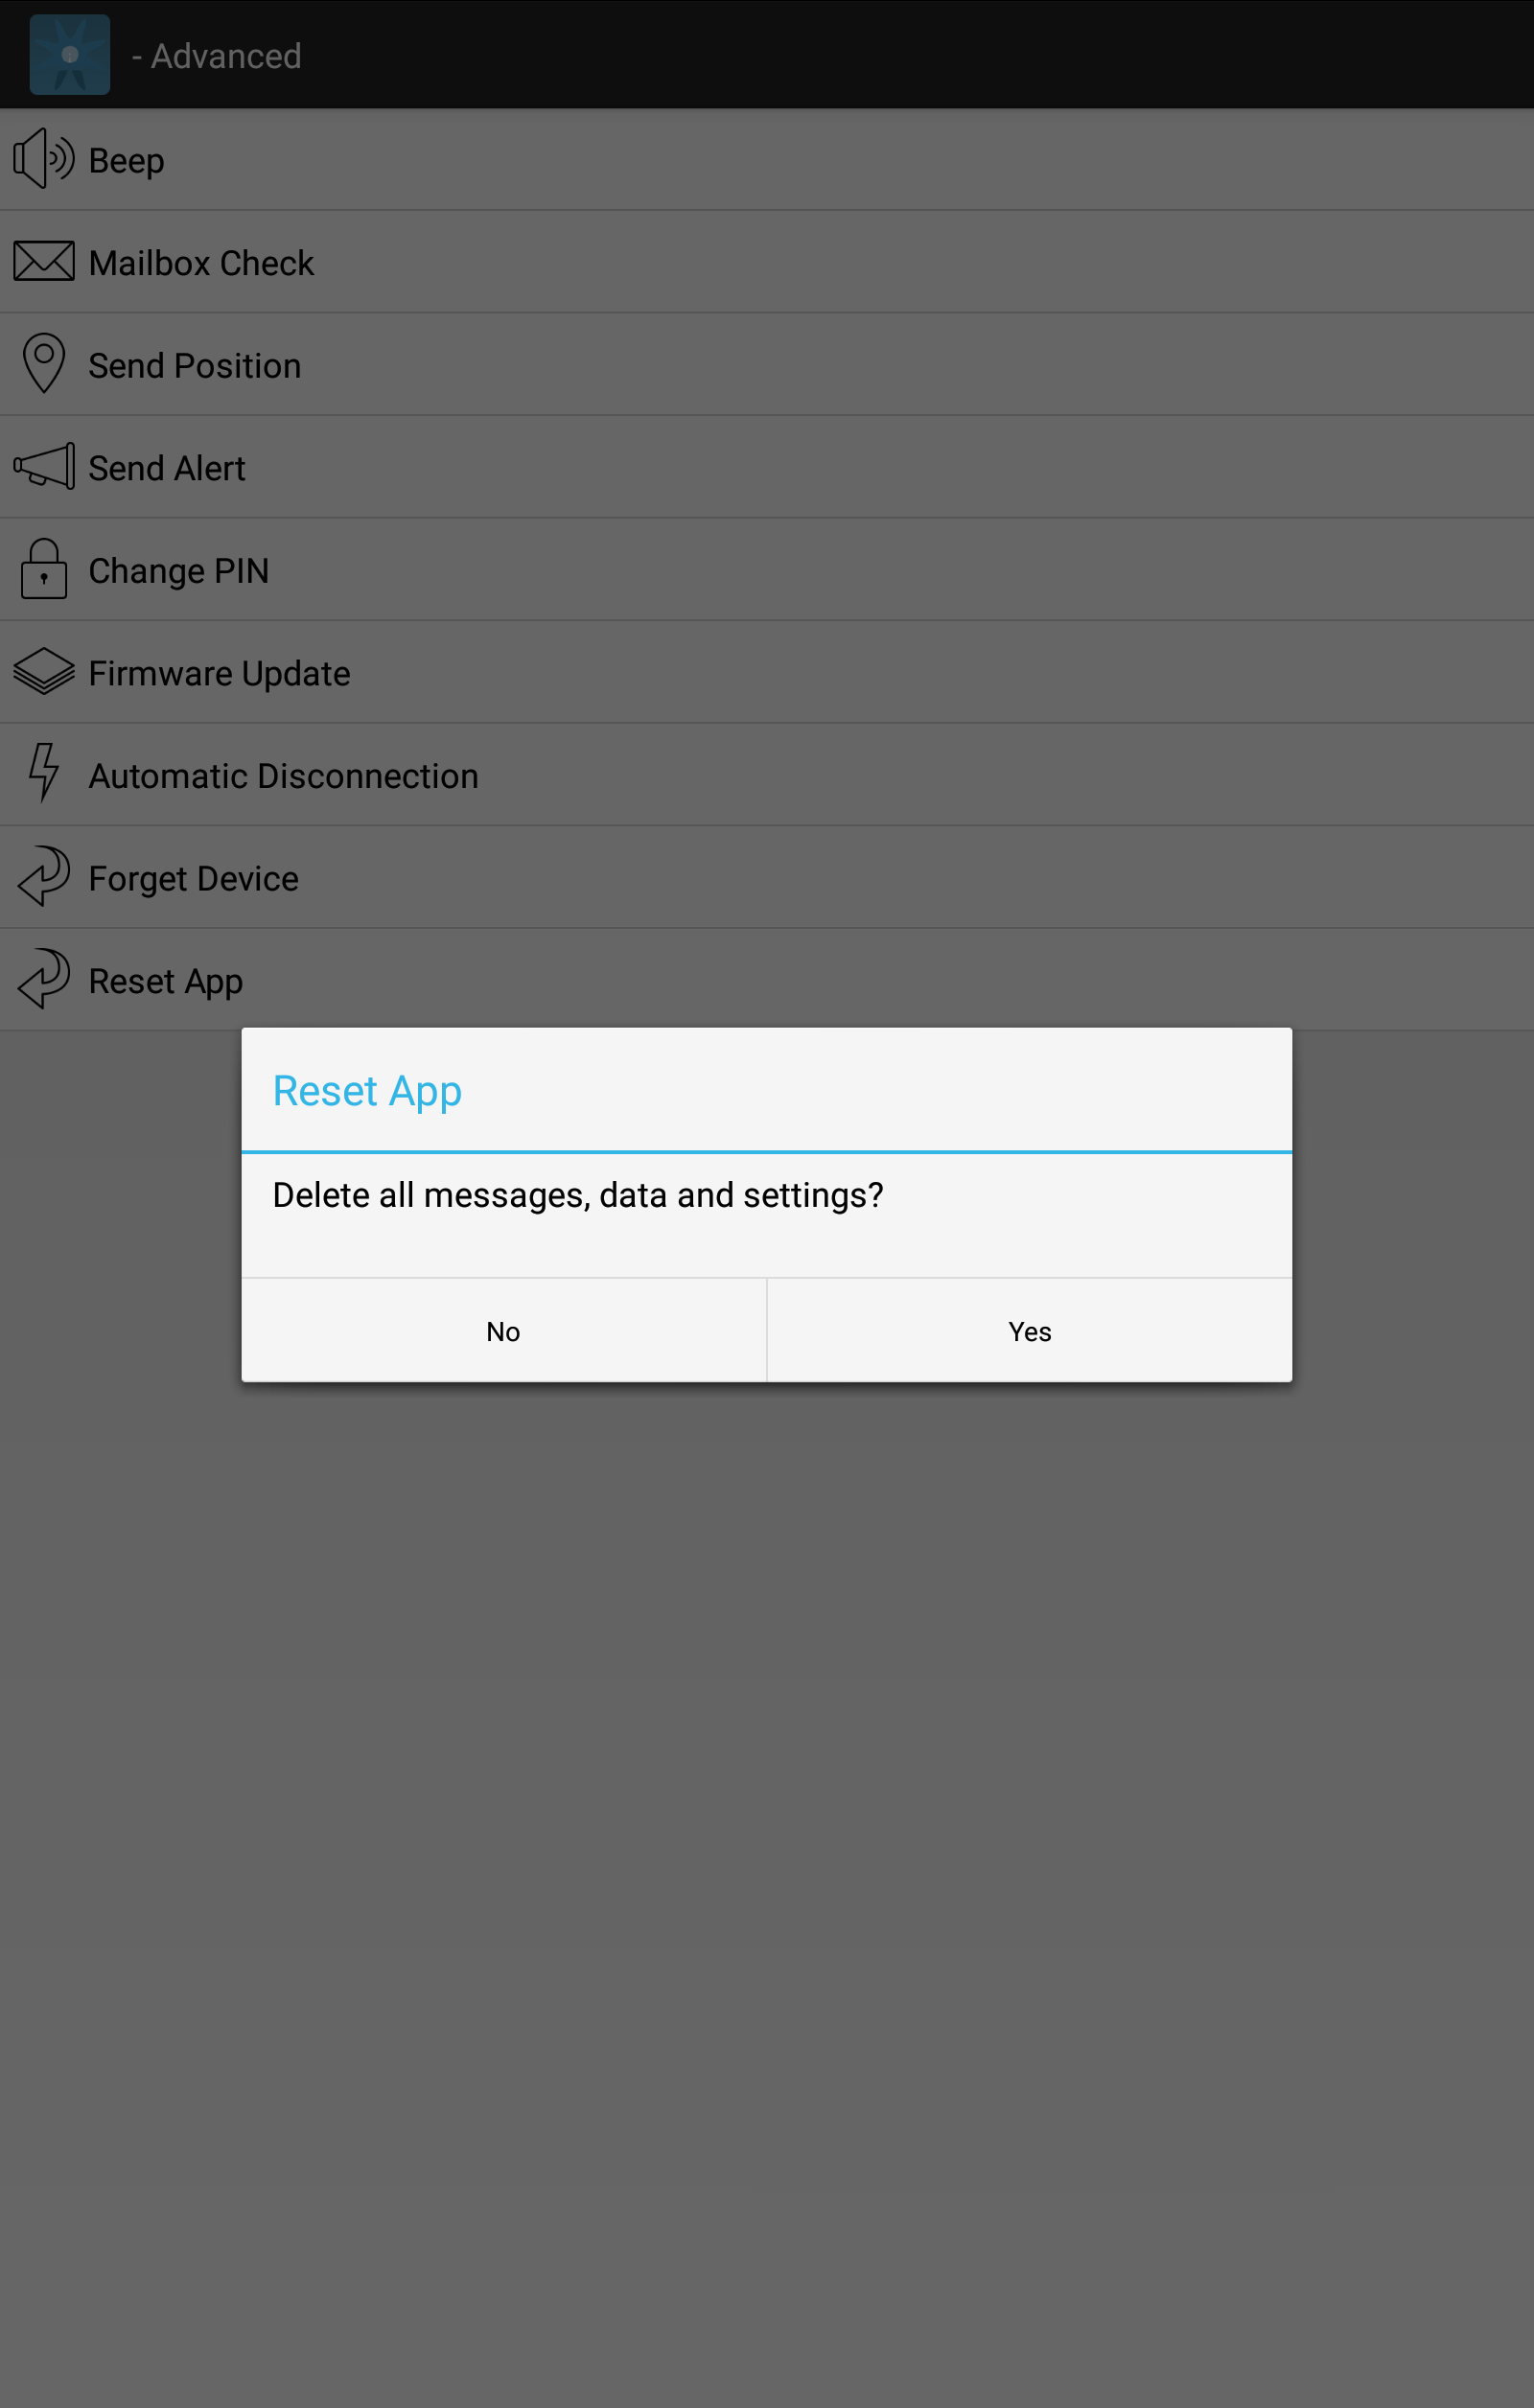 Reset App